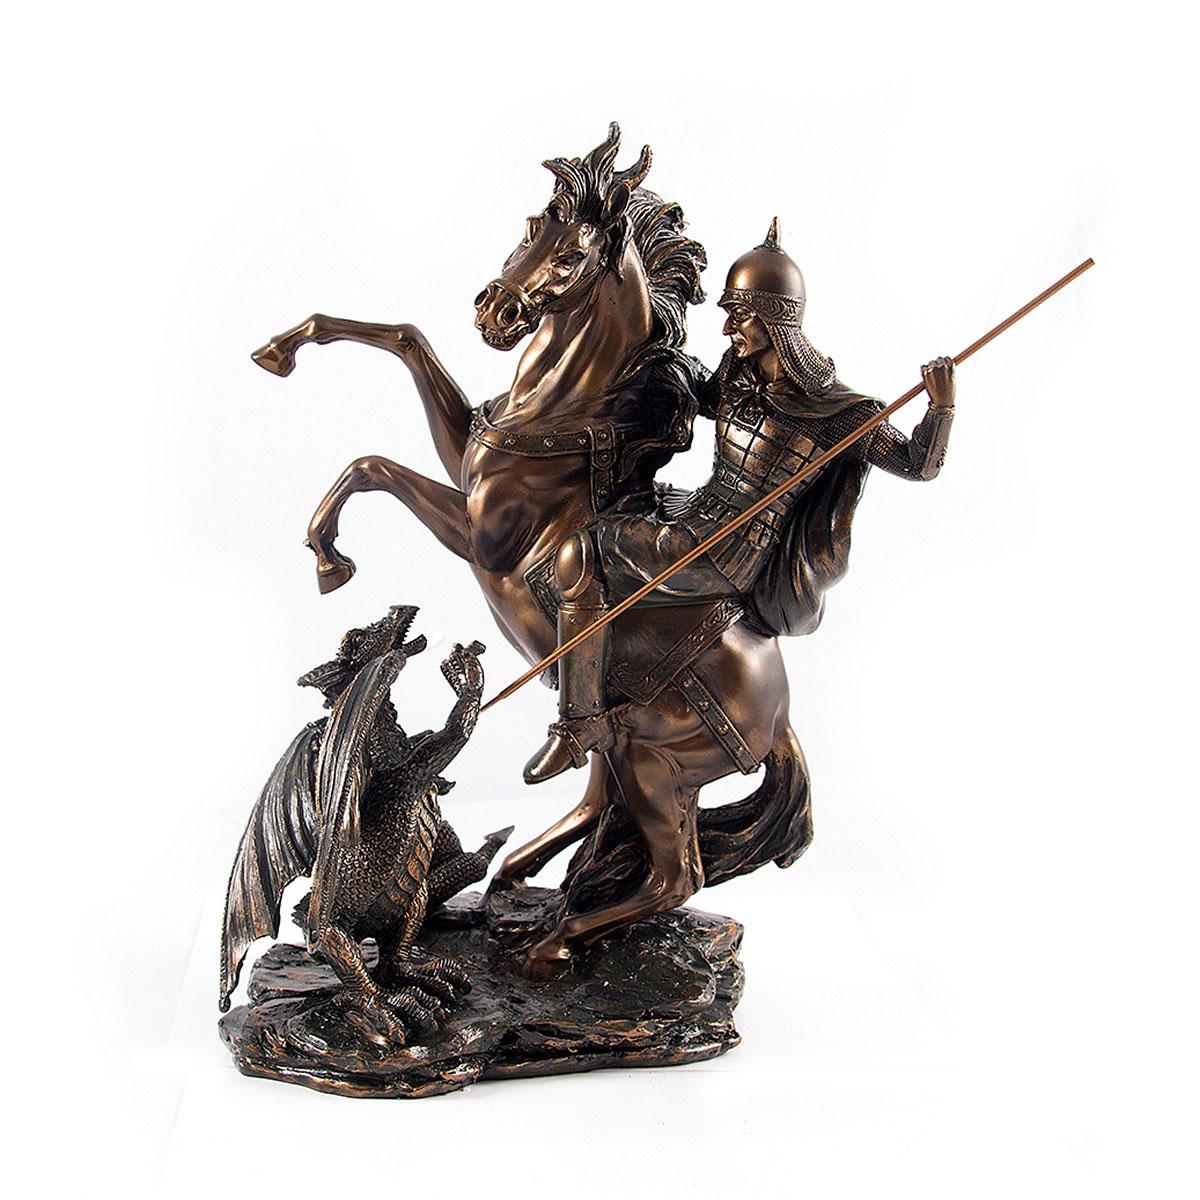 Статуэтка Русские Подарки Архангел Михаил, 28 х 36 см статуэтка русские подарки мисс рандеву 11 х 10 х 31 см